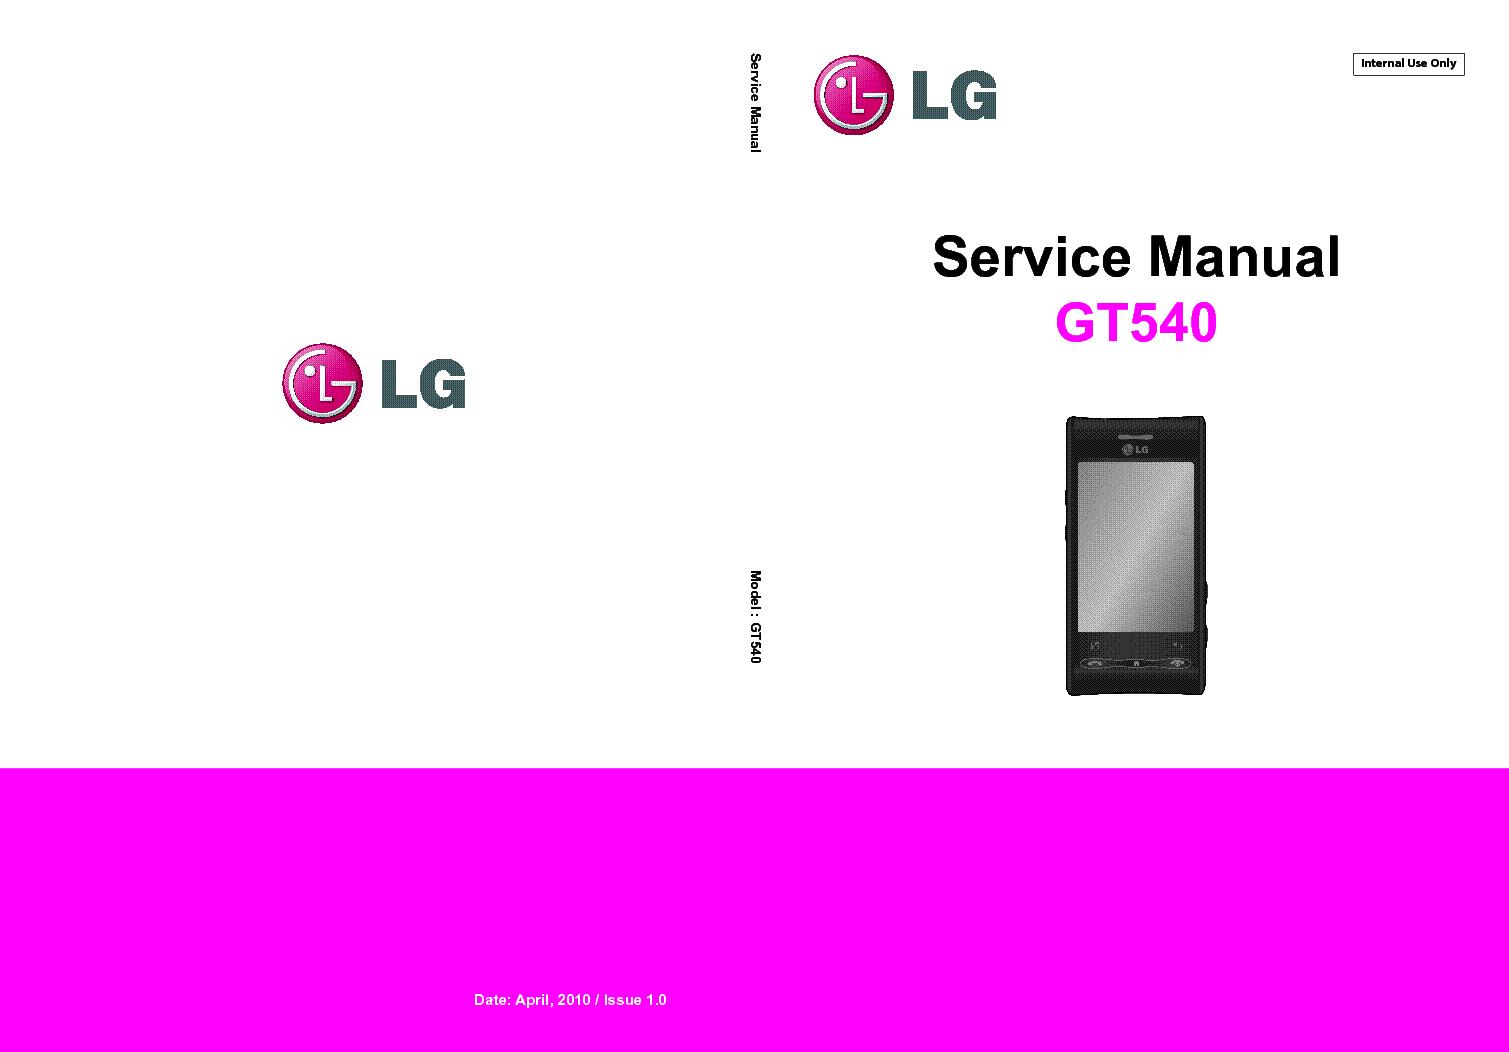 lg gt540 service manual download schematics eeprom repair info rh elektrotanya com LG Optimus Specification Full Sprint LG Optimus S